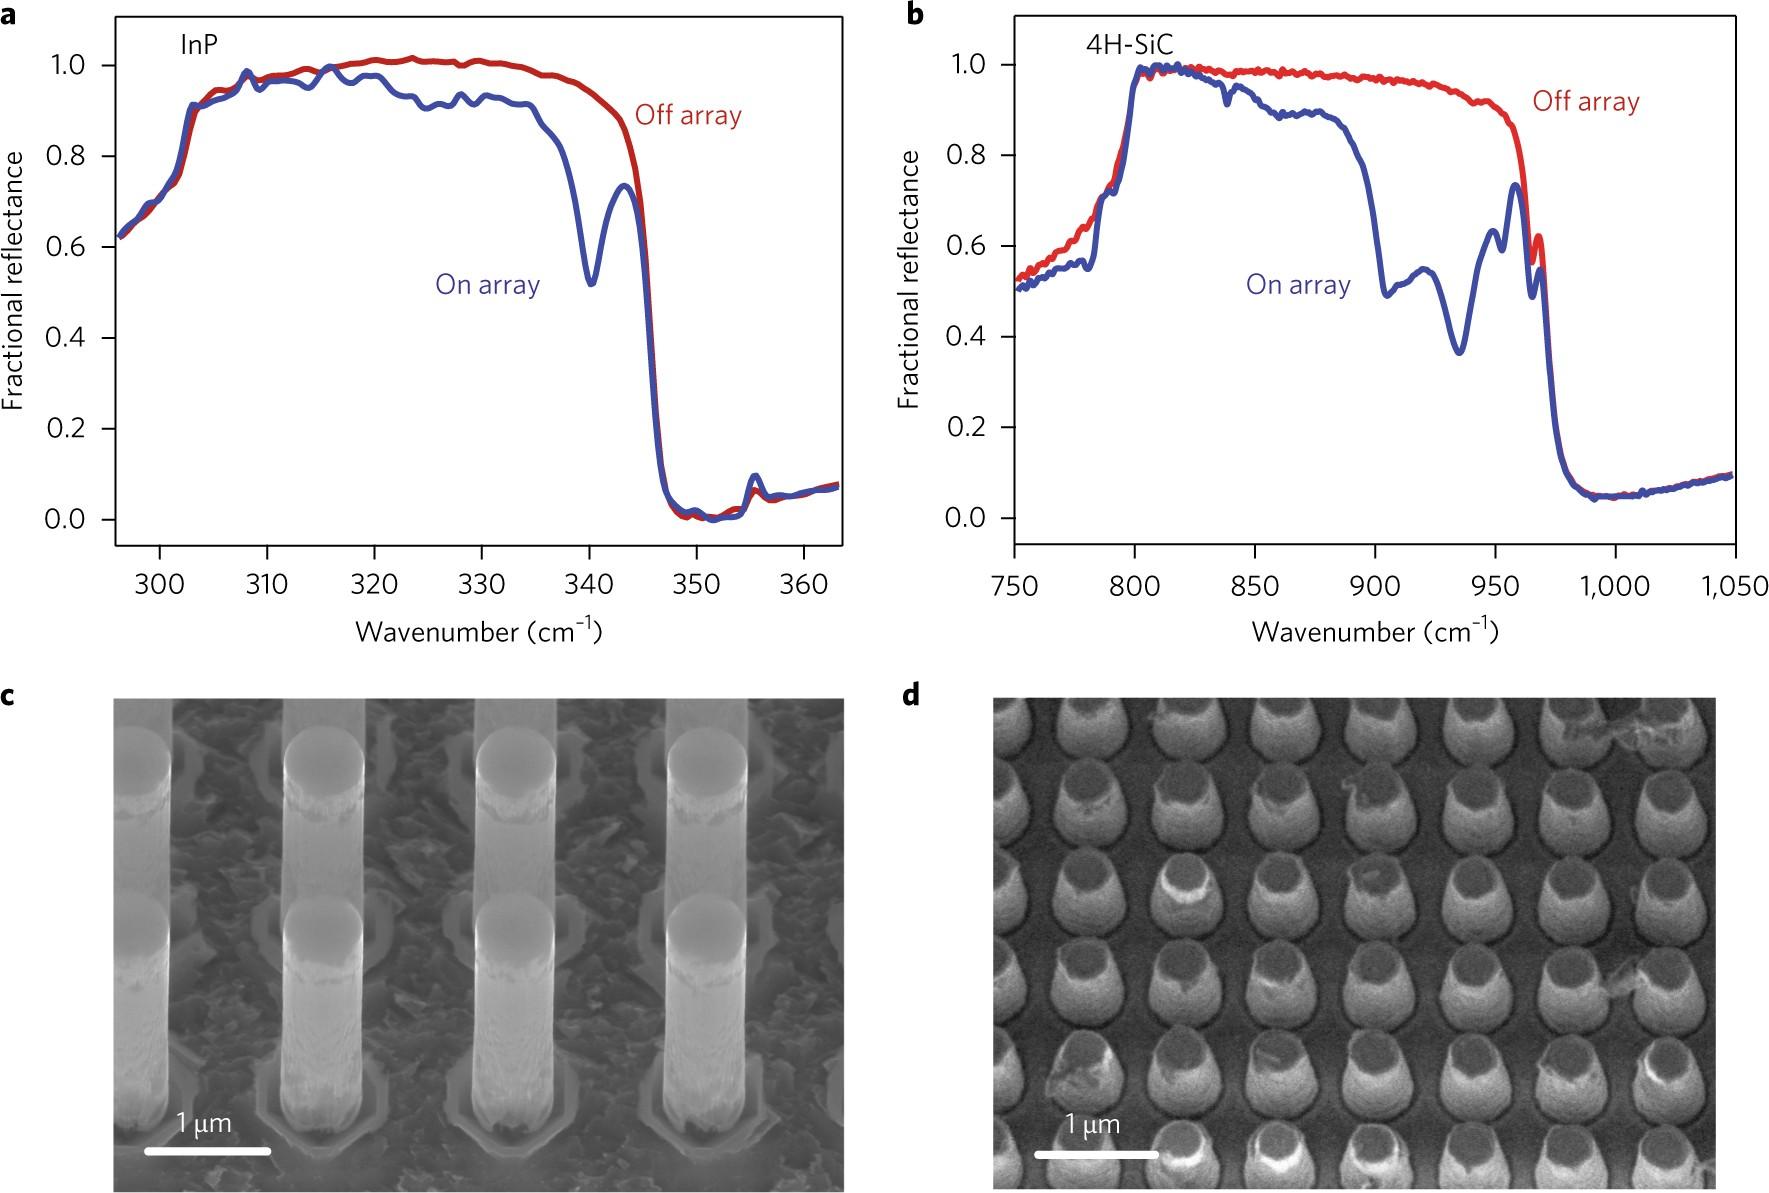 Active Tuning Of Surface Phonon Polariton Resonances Via Carrier Insight On Analog And Digital Lockin Amplifiers Operation Principle Photoinjection Nature Photonics